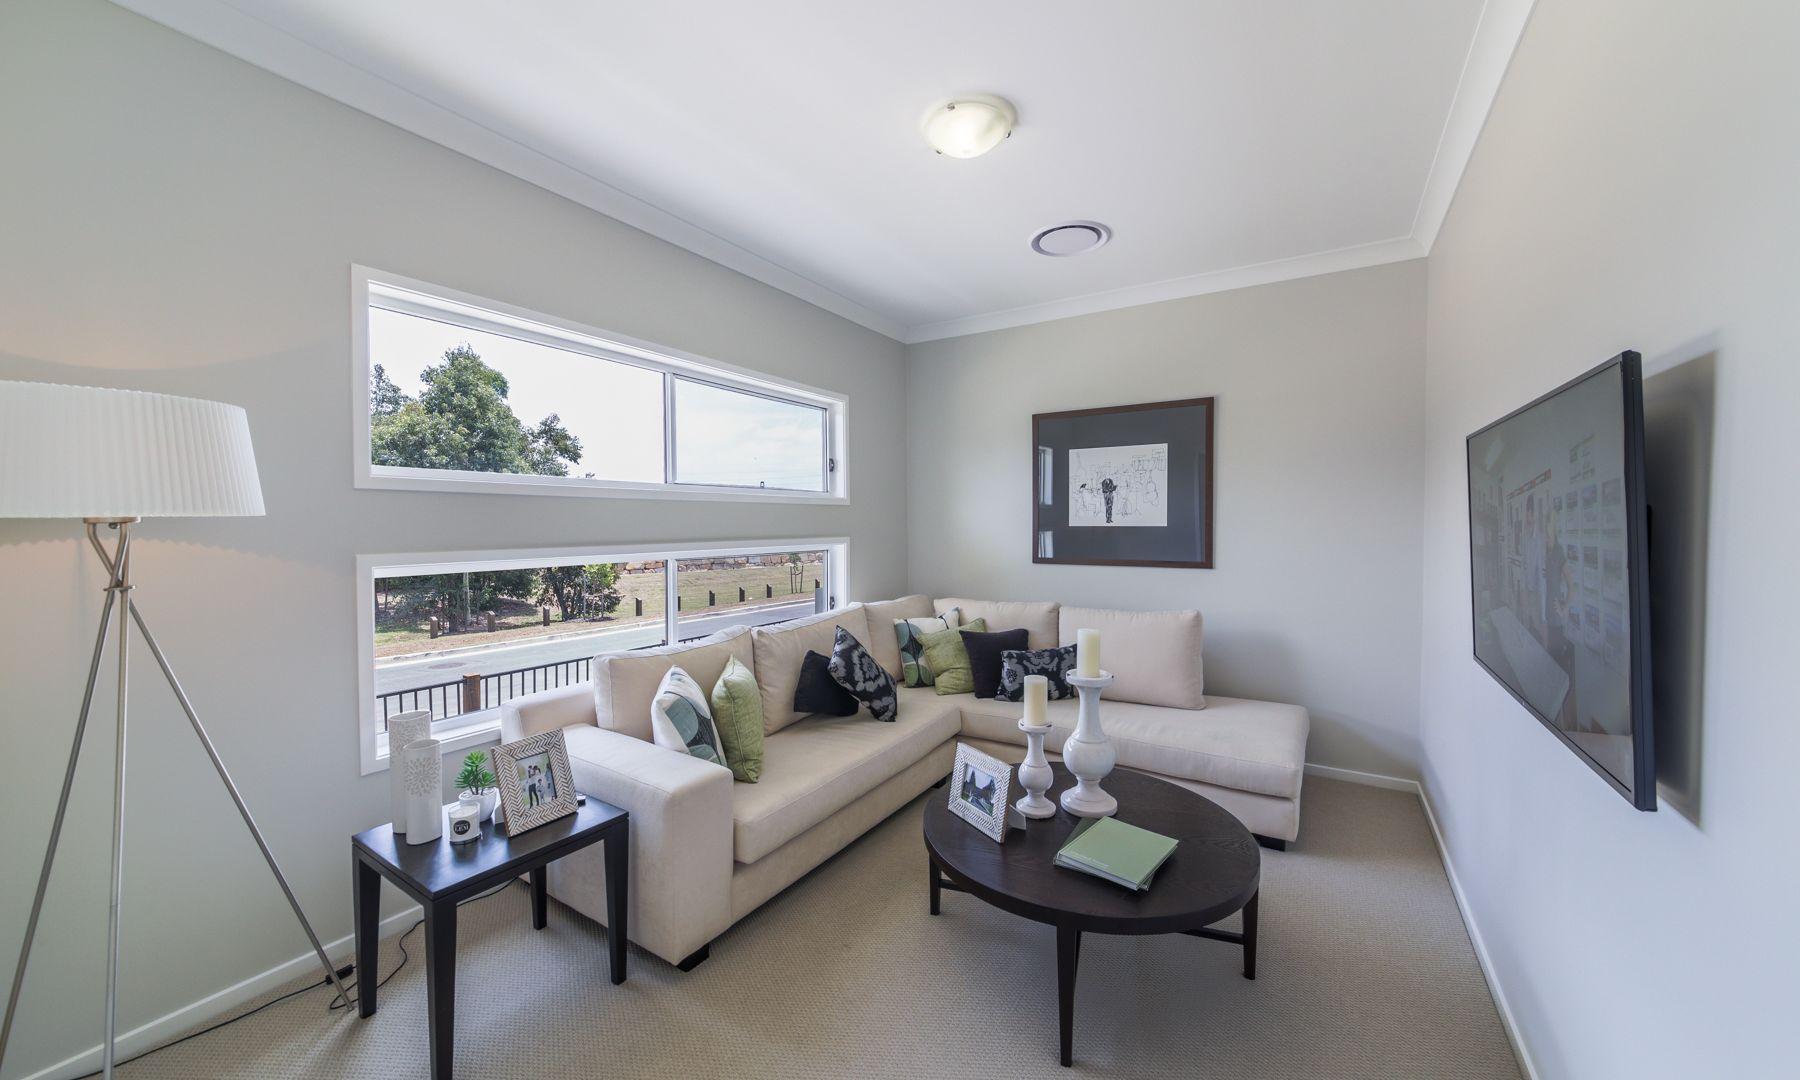 Lot 2 Bradman Drive, Boorooma NSW 2650, Image 1